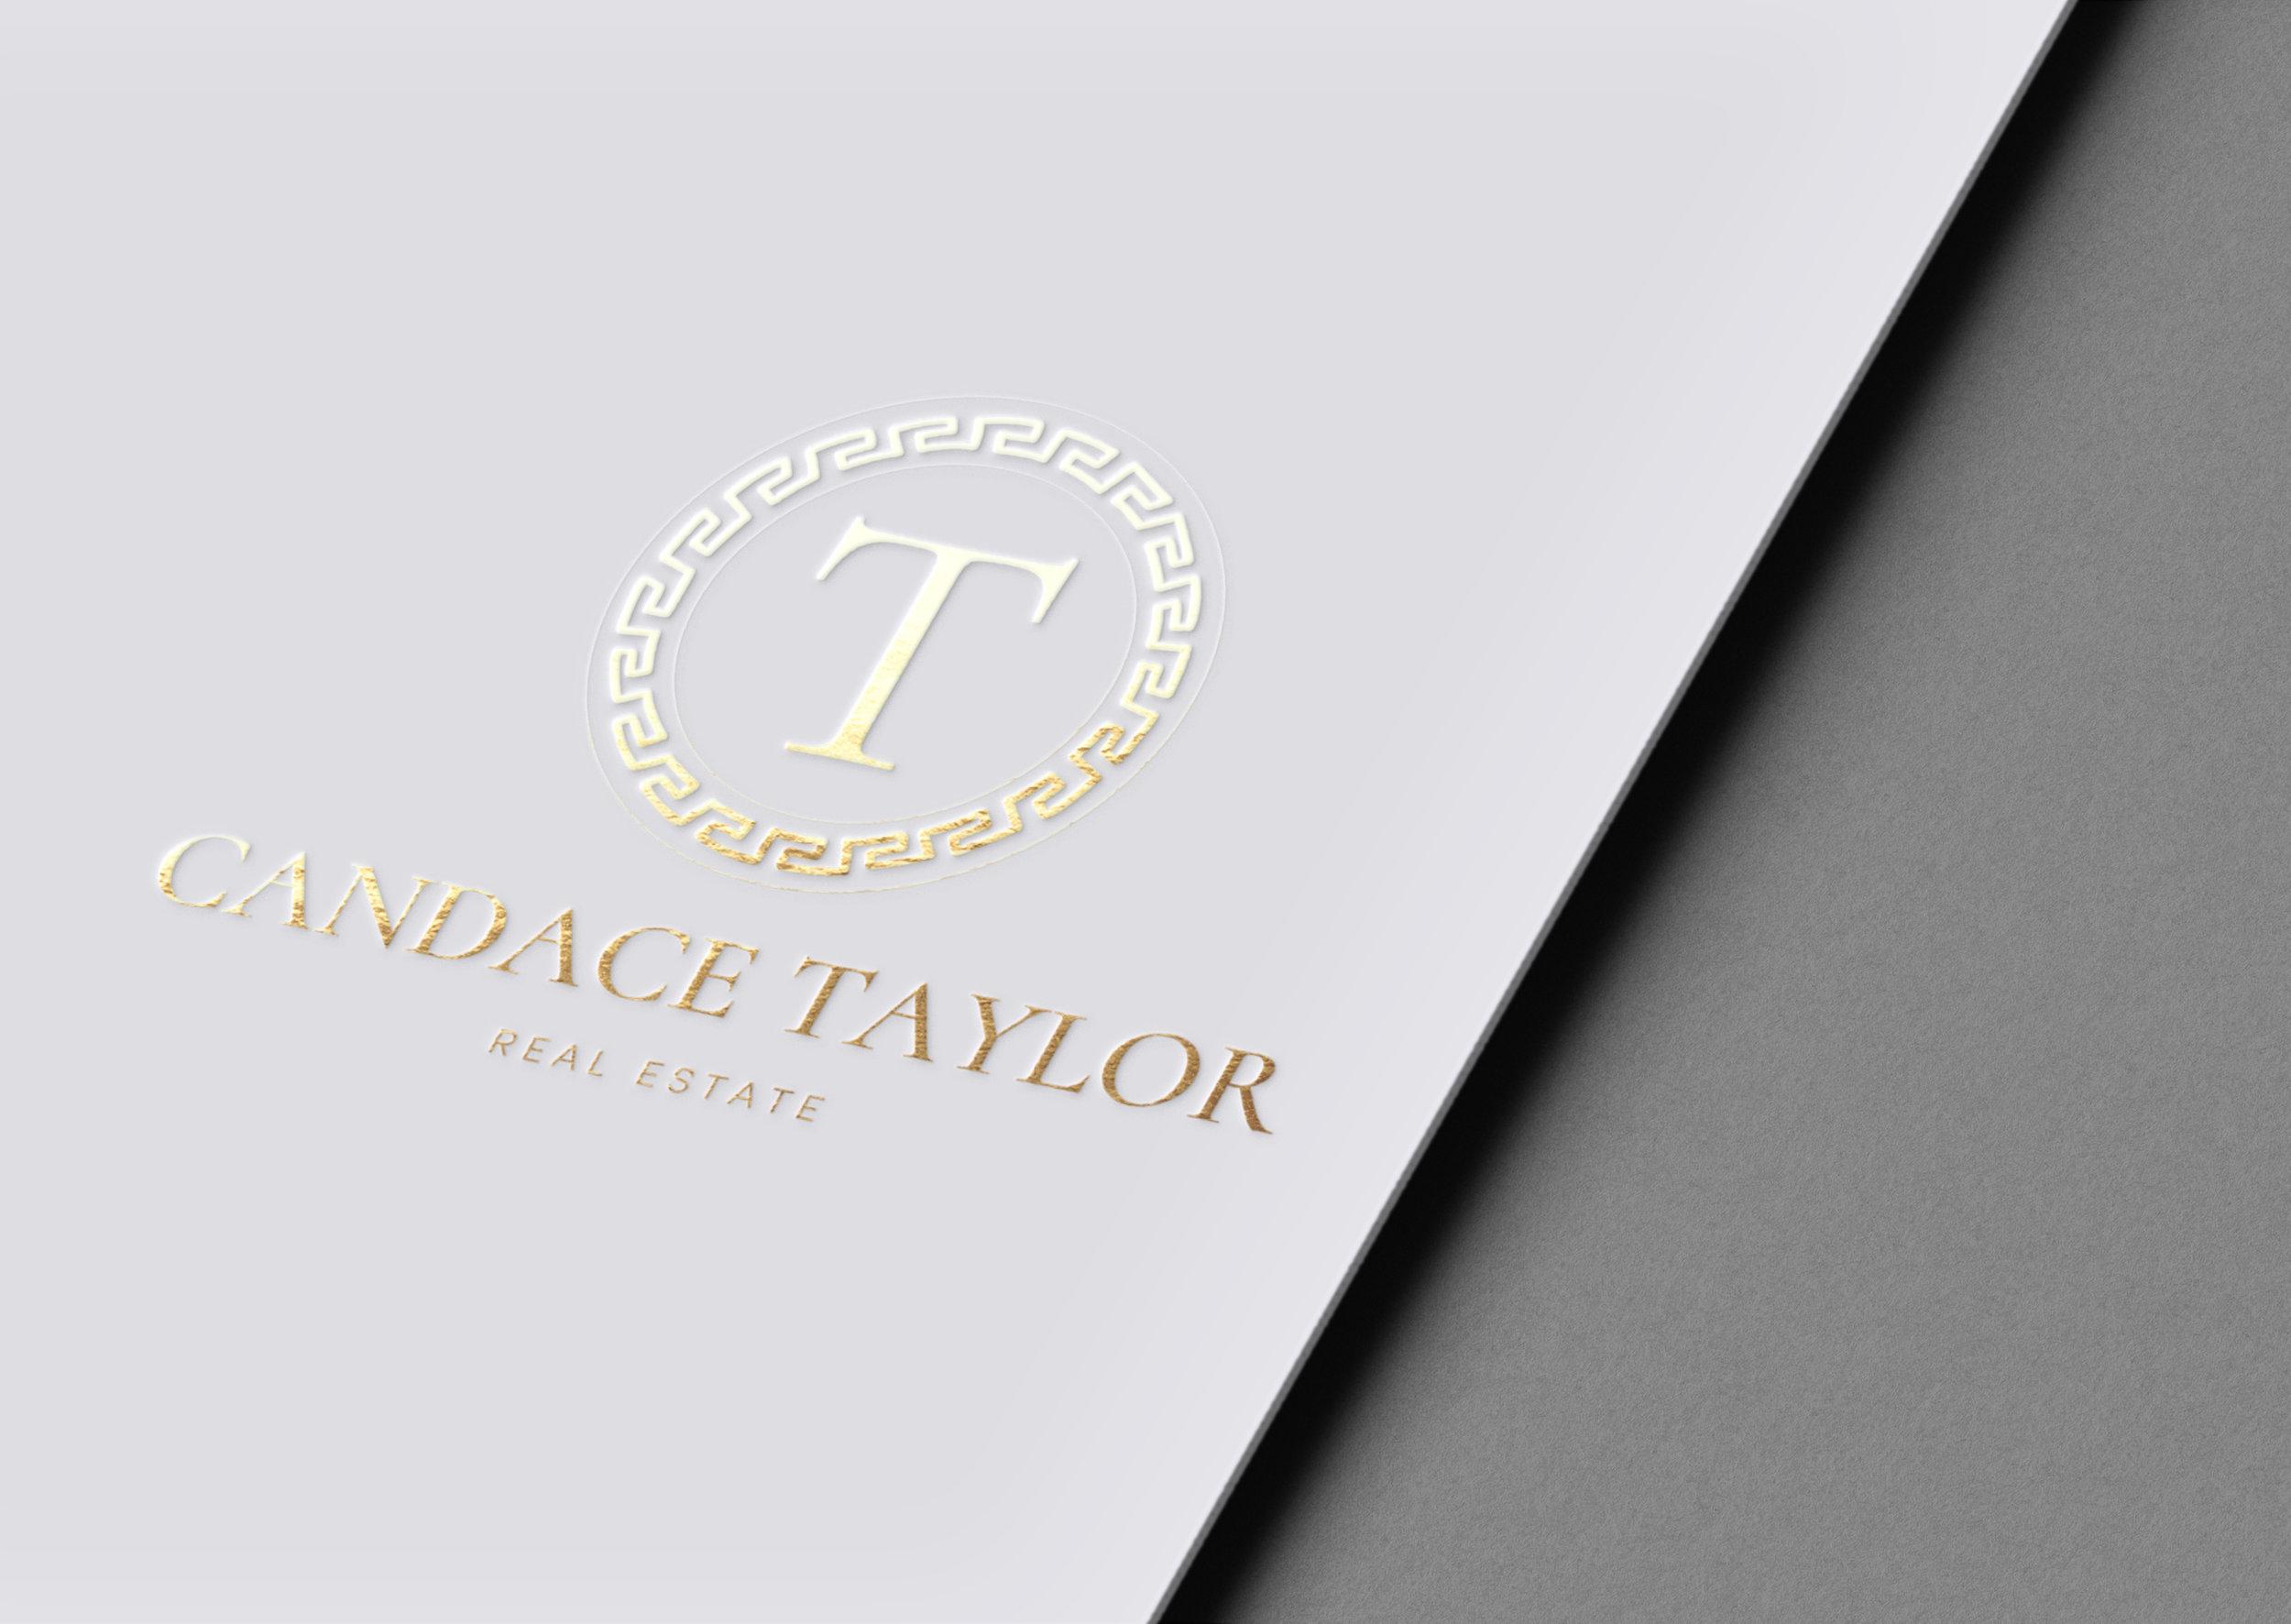 Candace Taylor (2).jpg